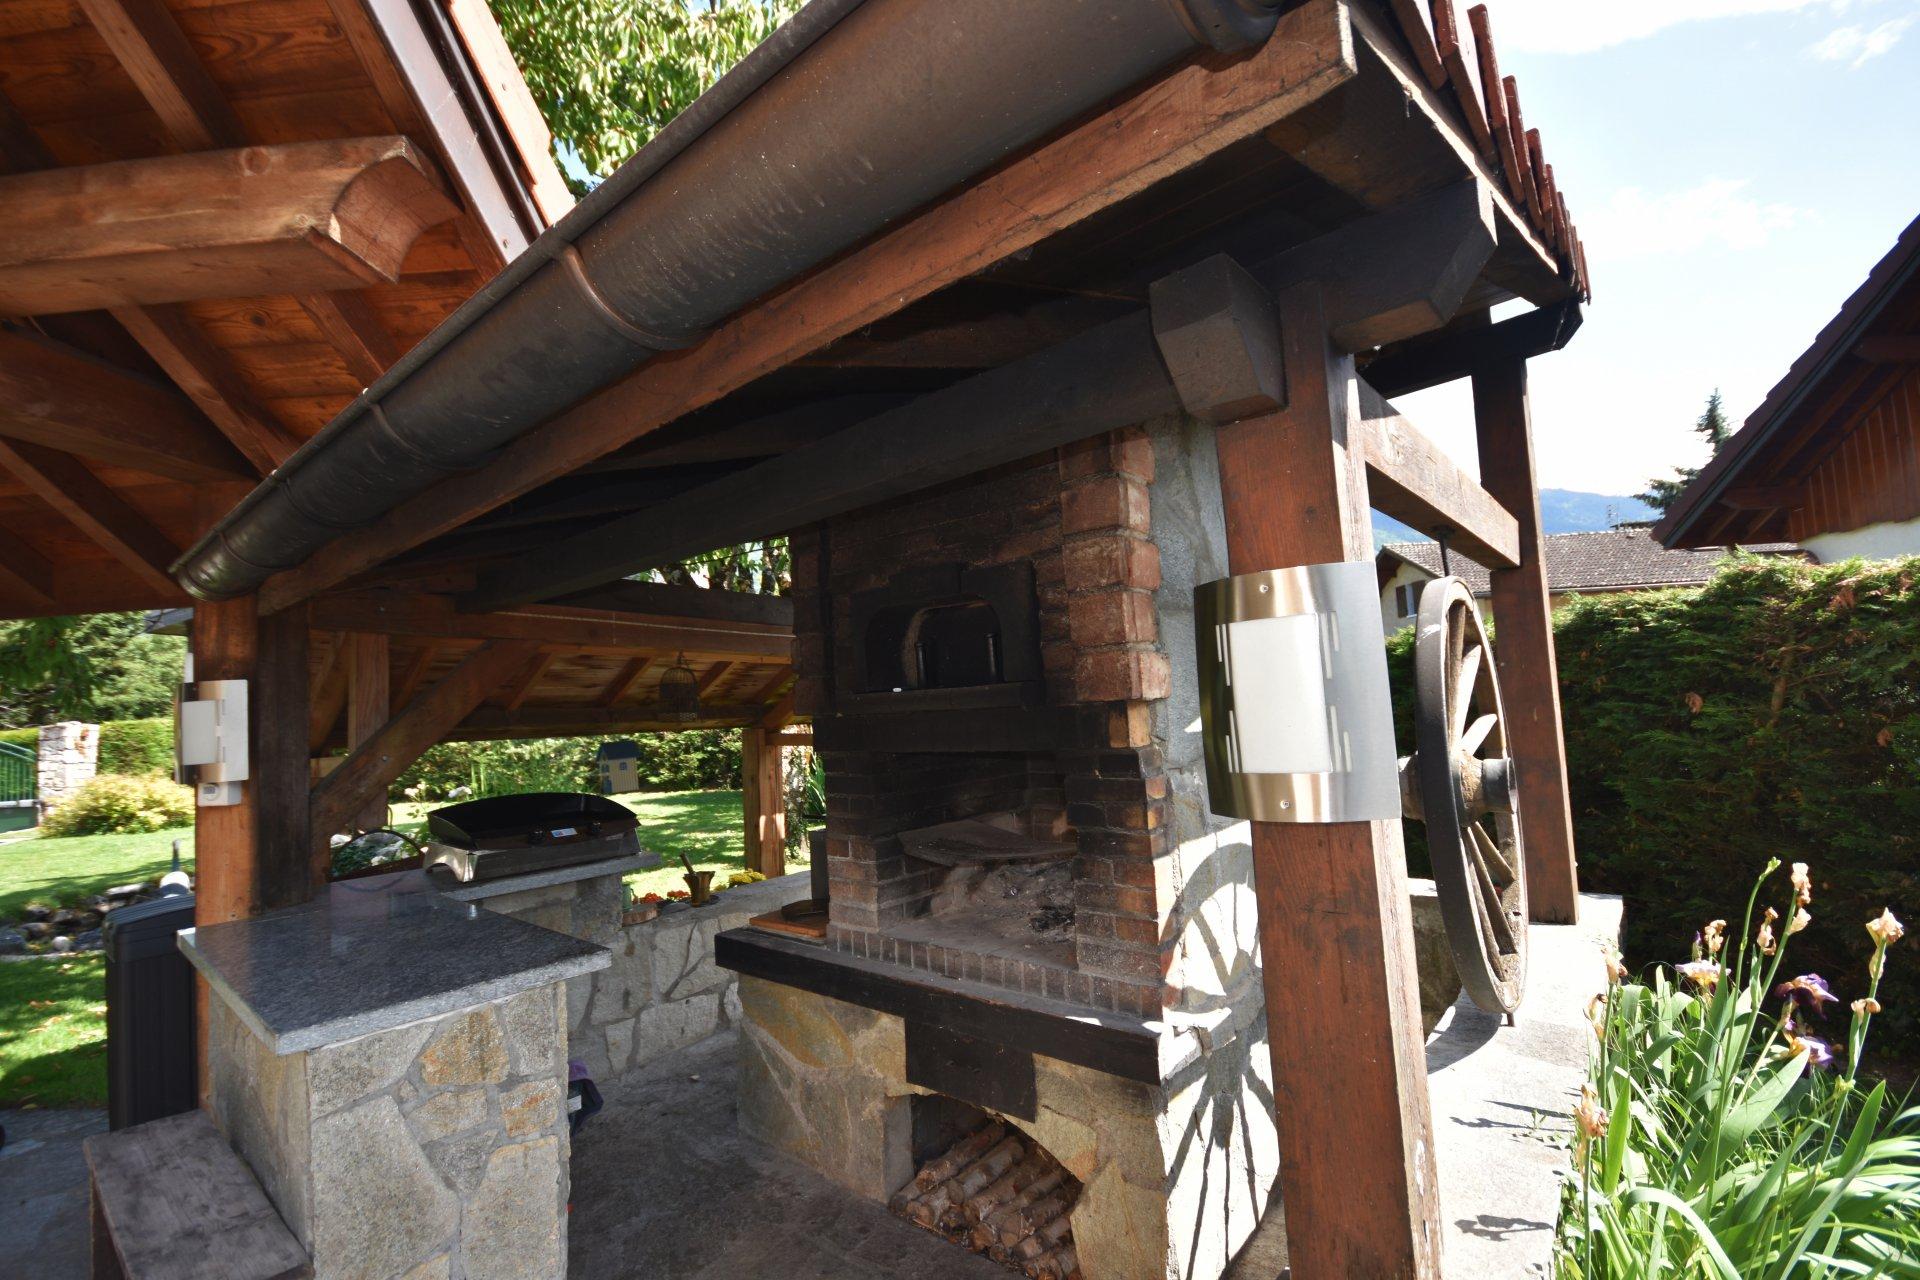 Maison 4 chambres / Garage / Terrain / Piscine